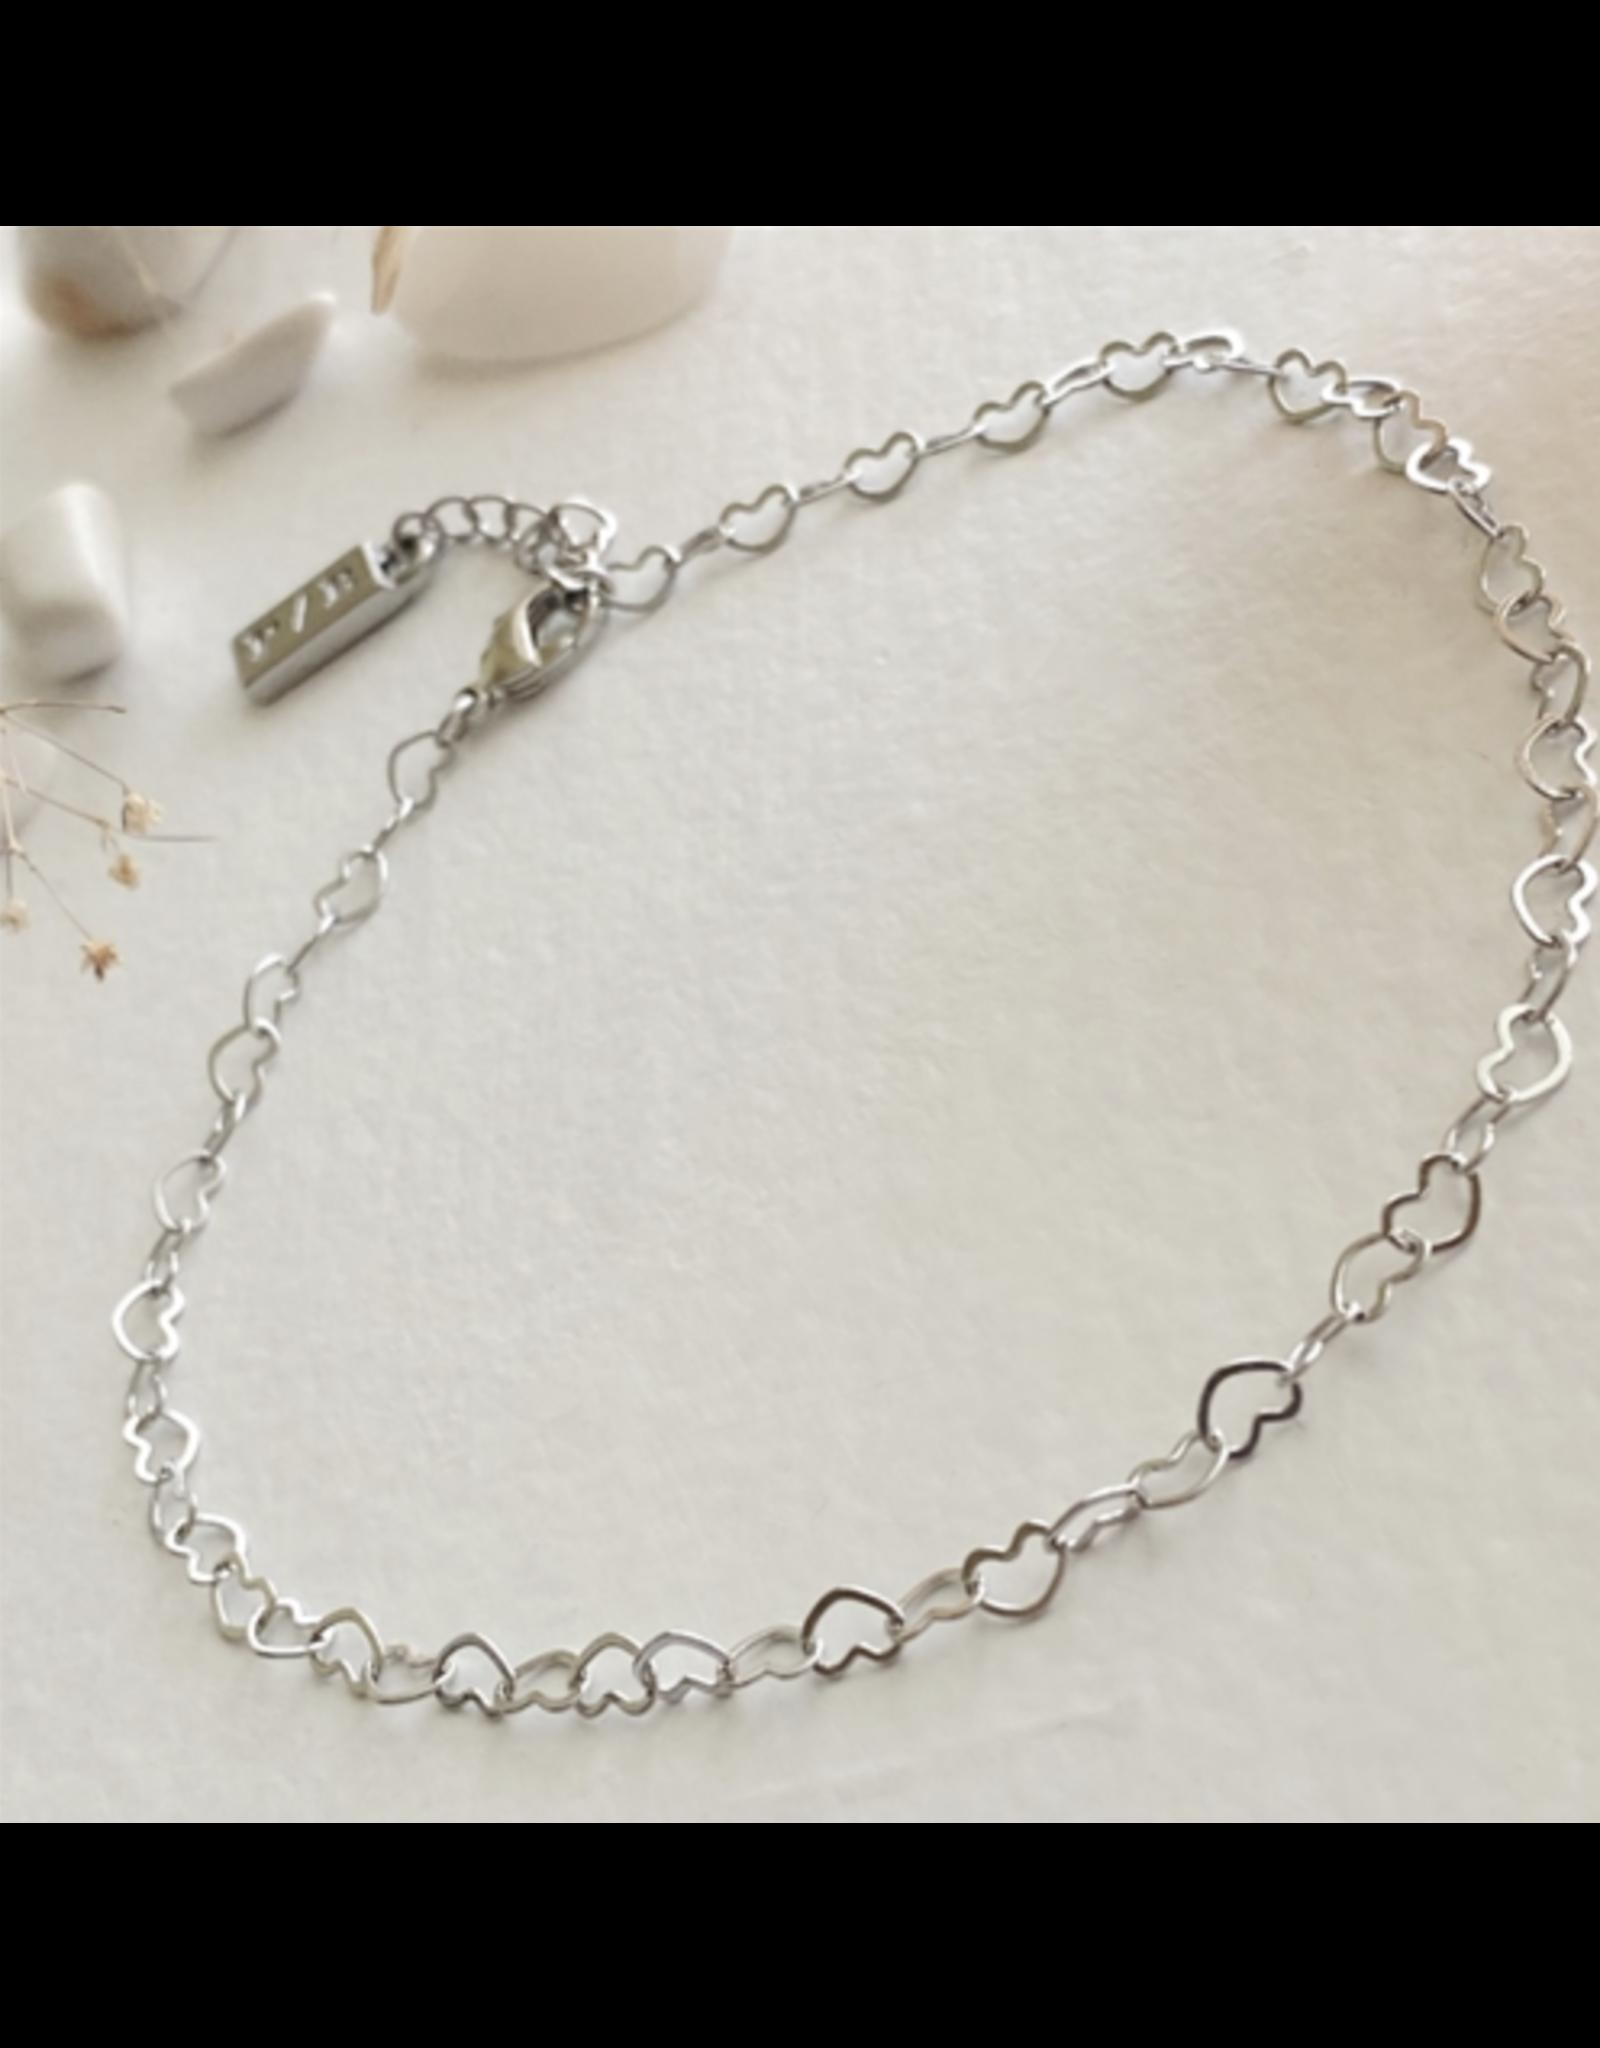 Pika & Bear Love Bites Bracelet